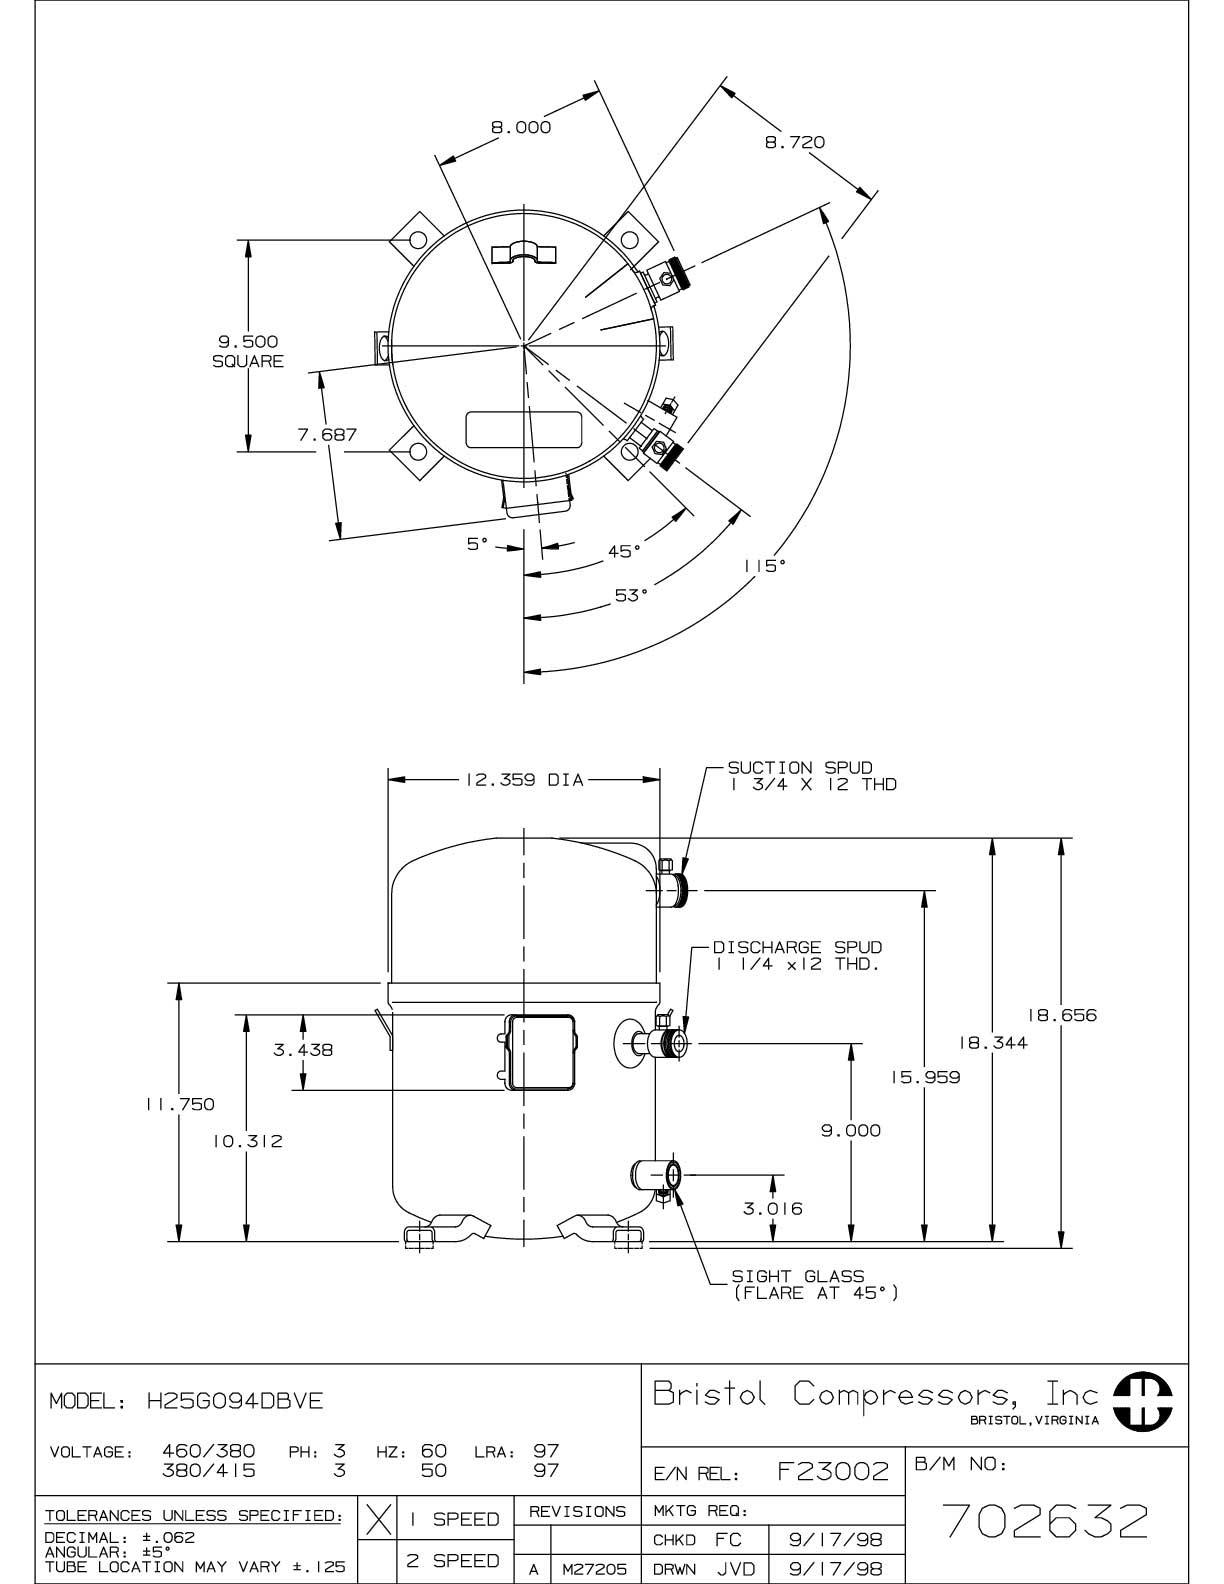 Bristol H25G094DBVE характеристики